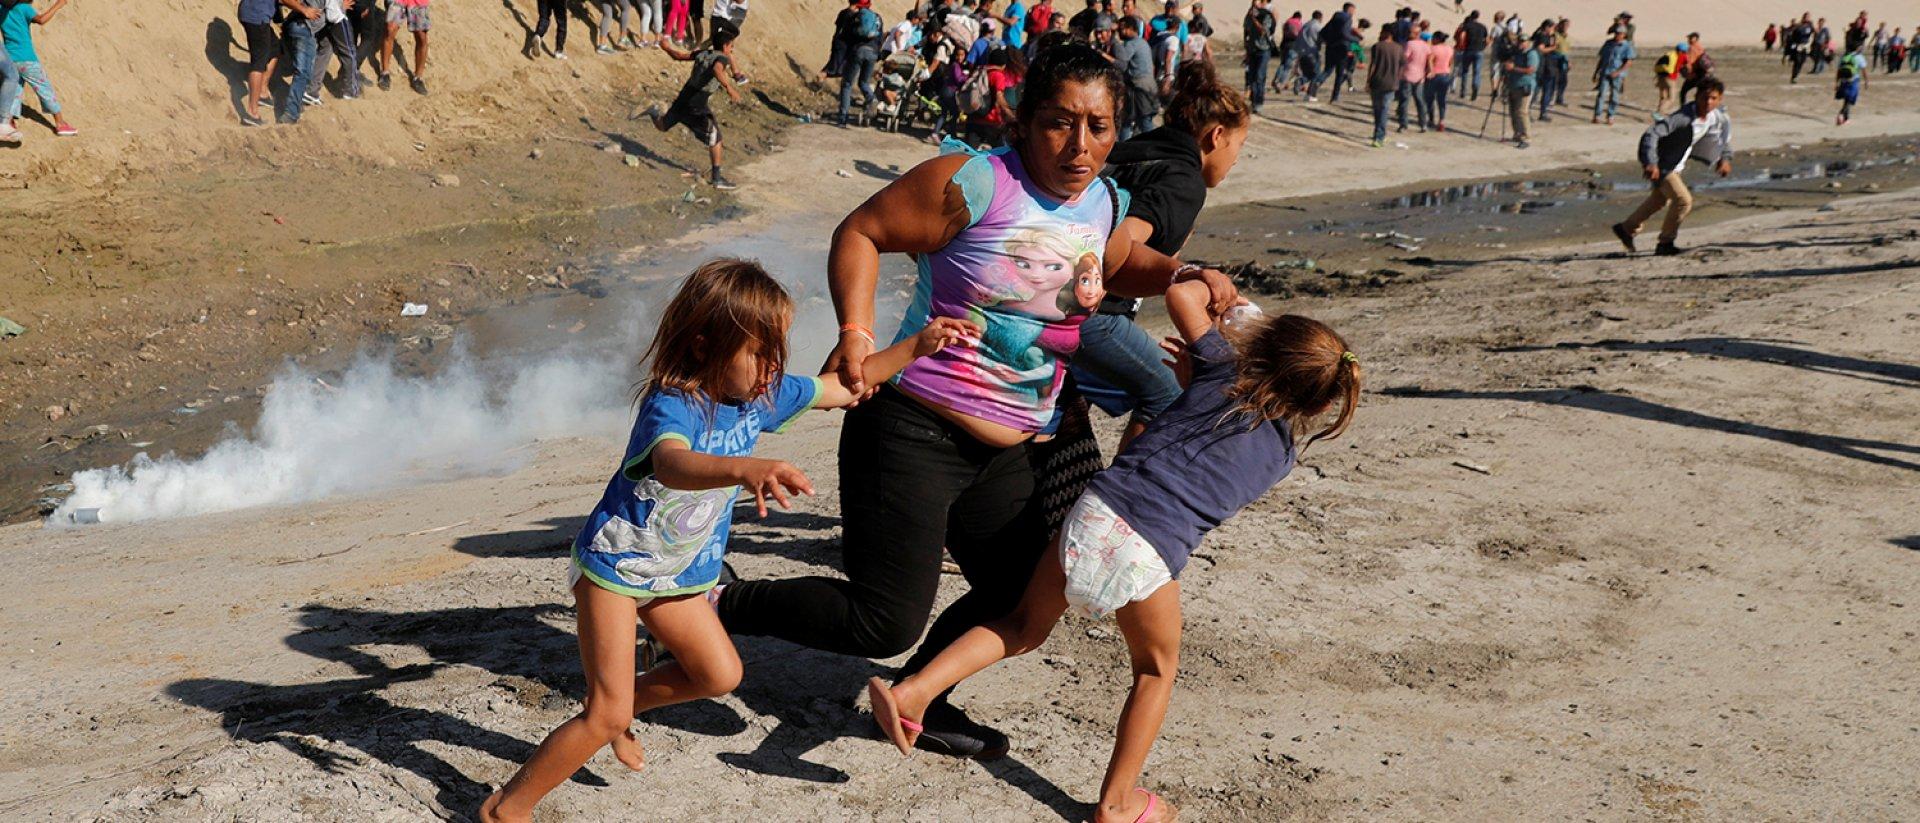 Gases lacrimogenos frontera mexico usa